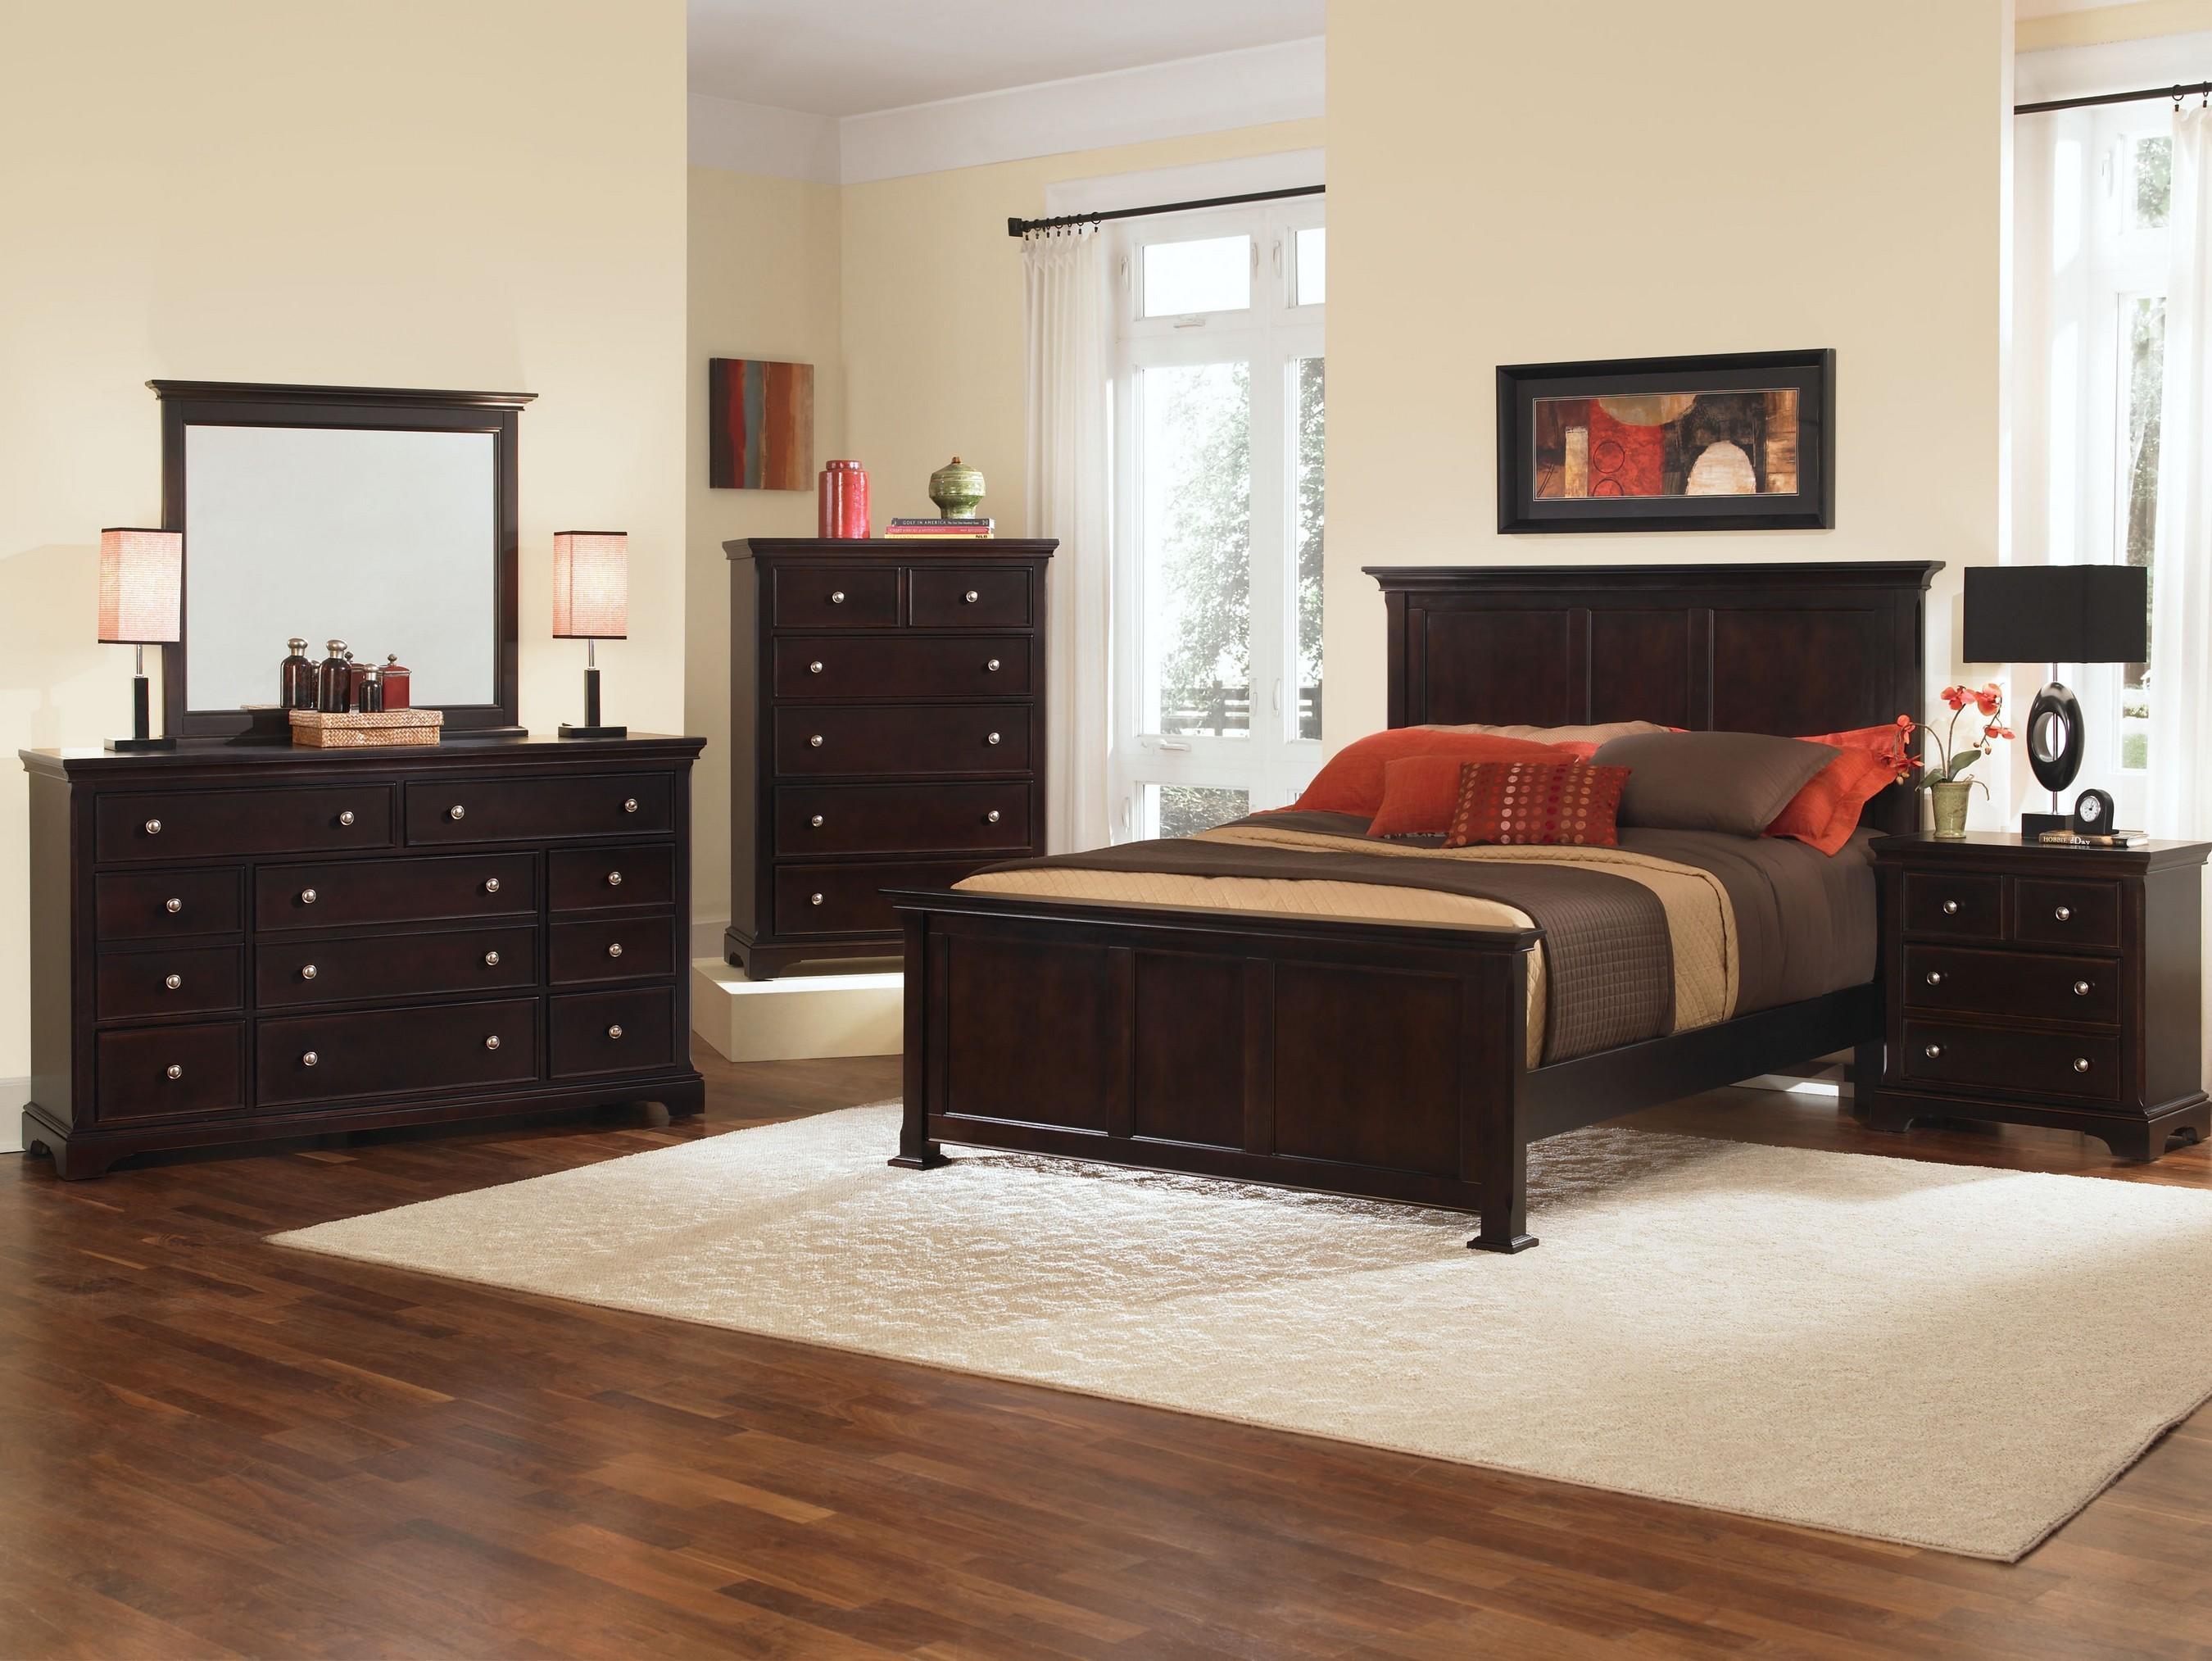 Vaughan Bassett Forsyth California King Bedroom Group - Item Number: BB76 CK Bedroom Group 2